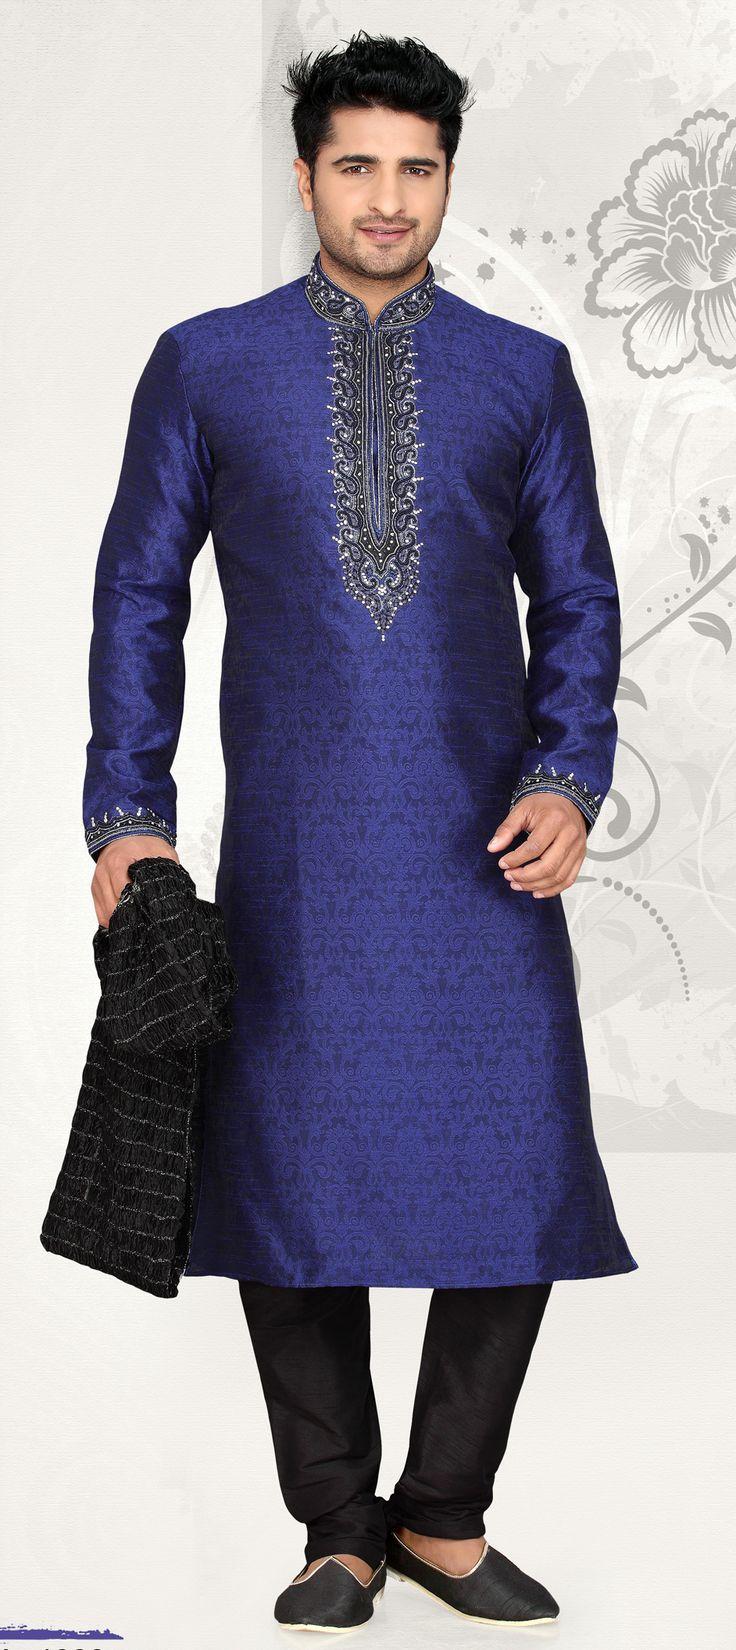 501323: Blue color family Kurta Pyjamas. Fabric: Brocade, Jacquard Work: Bugle Beads, Cut Dana, Stone Color Family: Blue Washing Instruction: Dry Wash